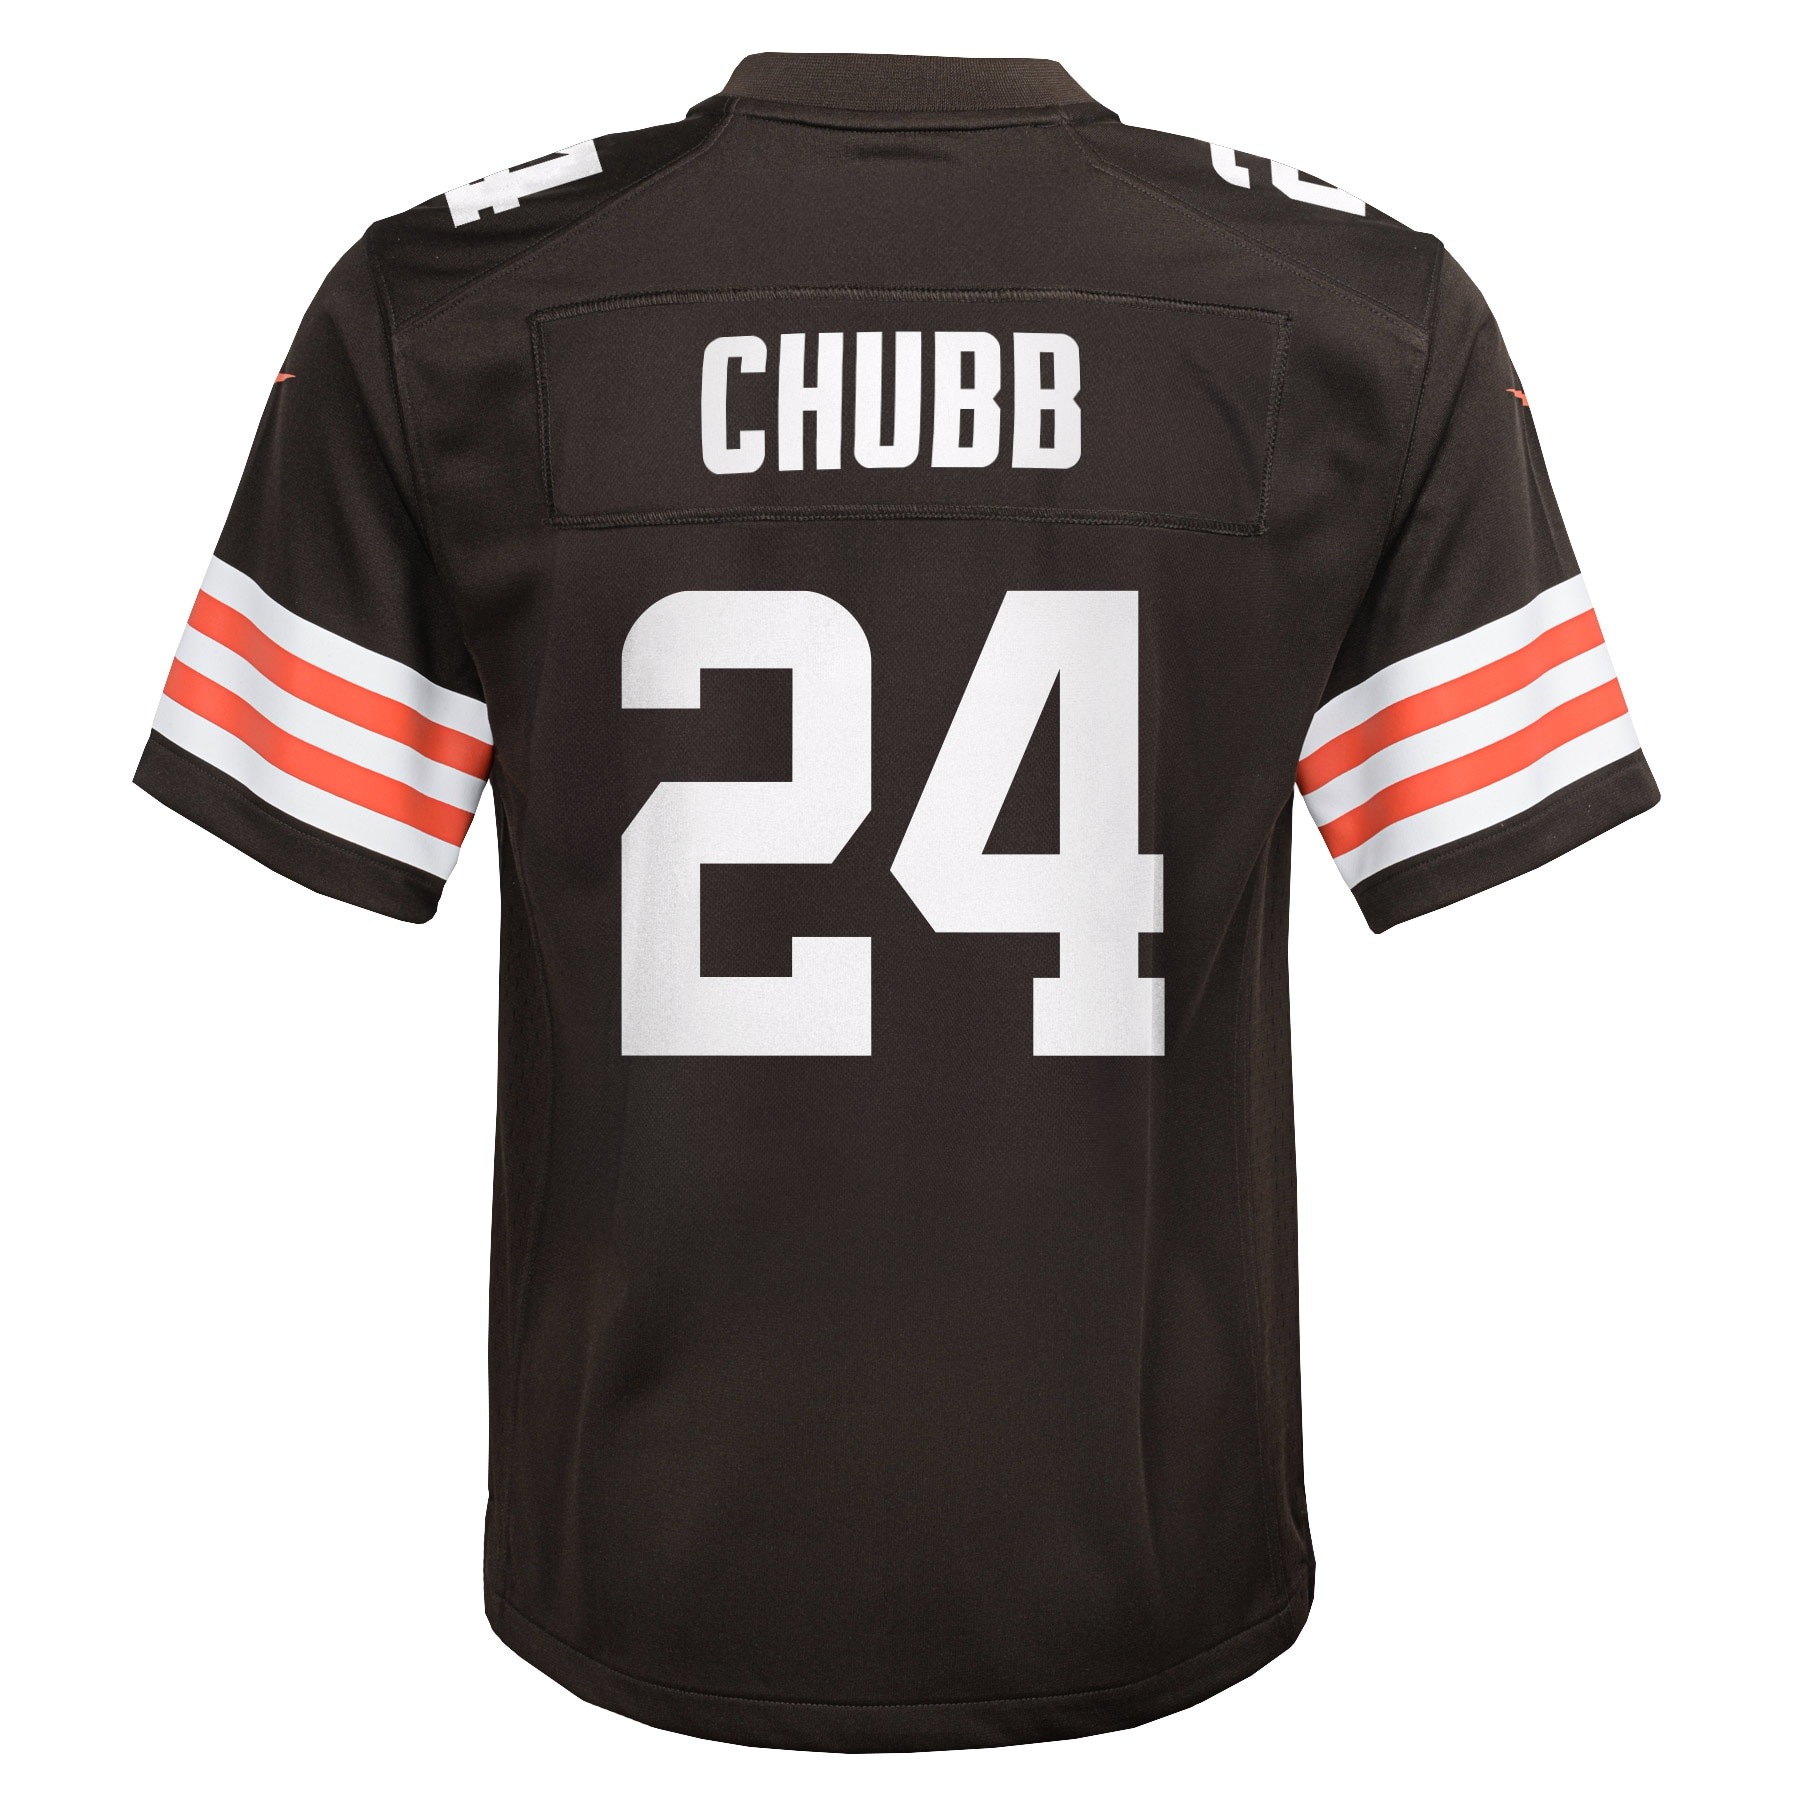 nick chubb toddler jersey